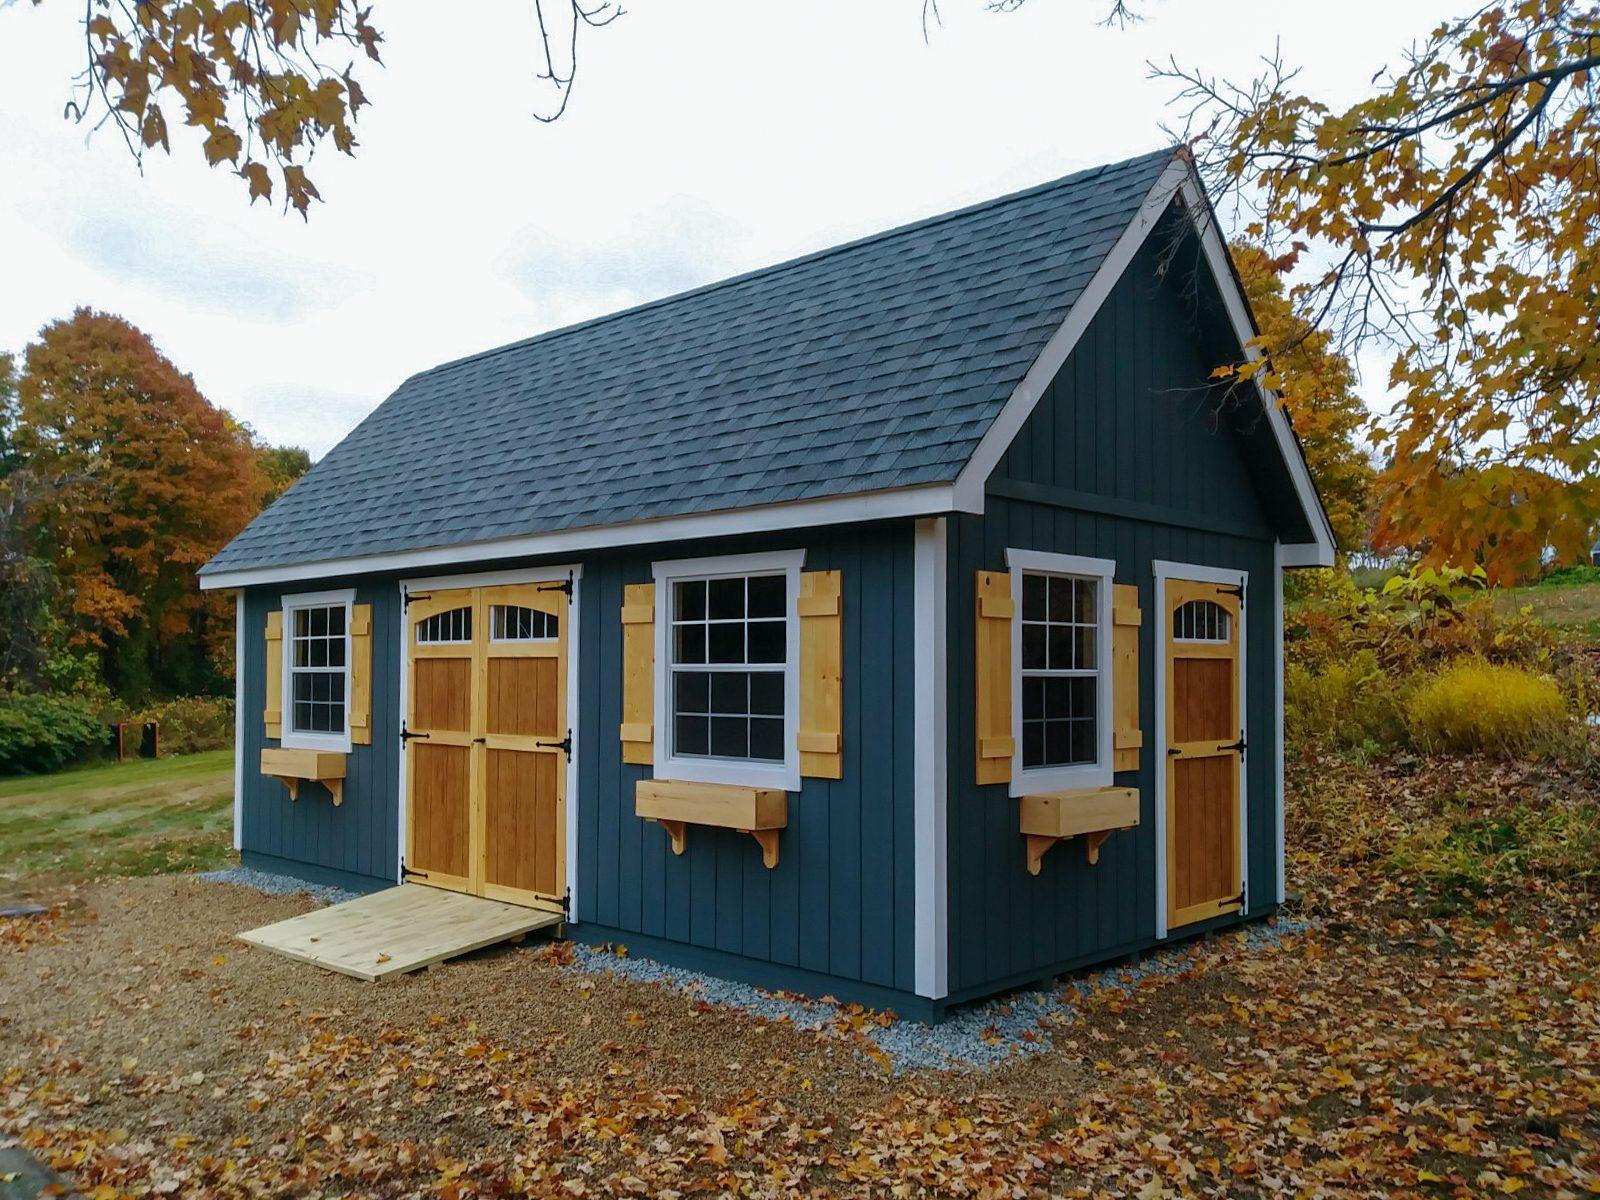 custom made large sheds in framingham ma